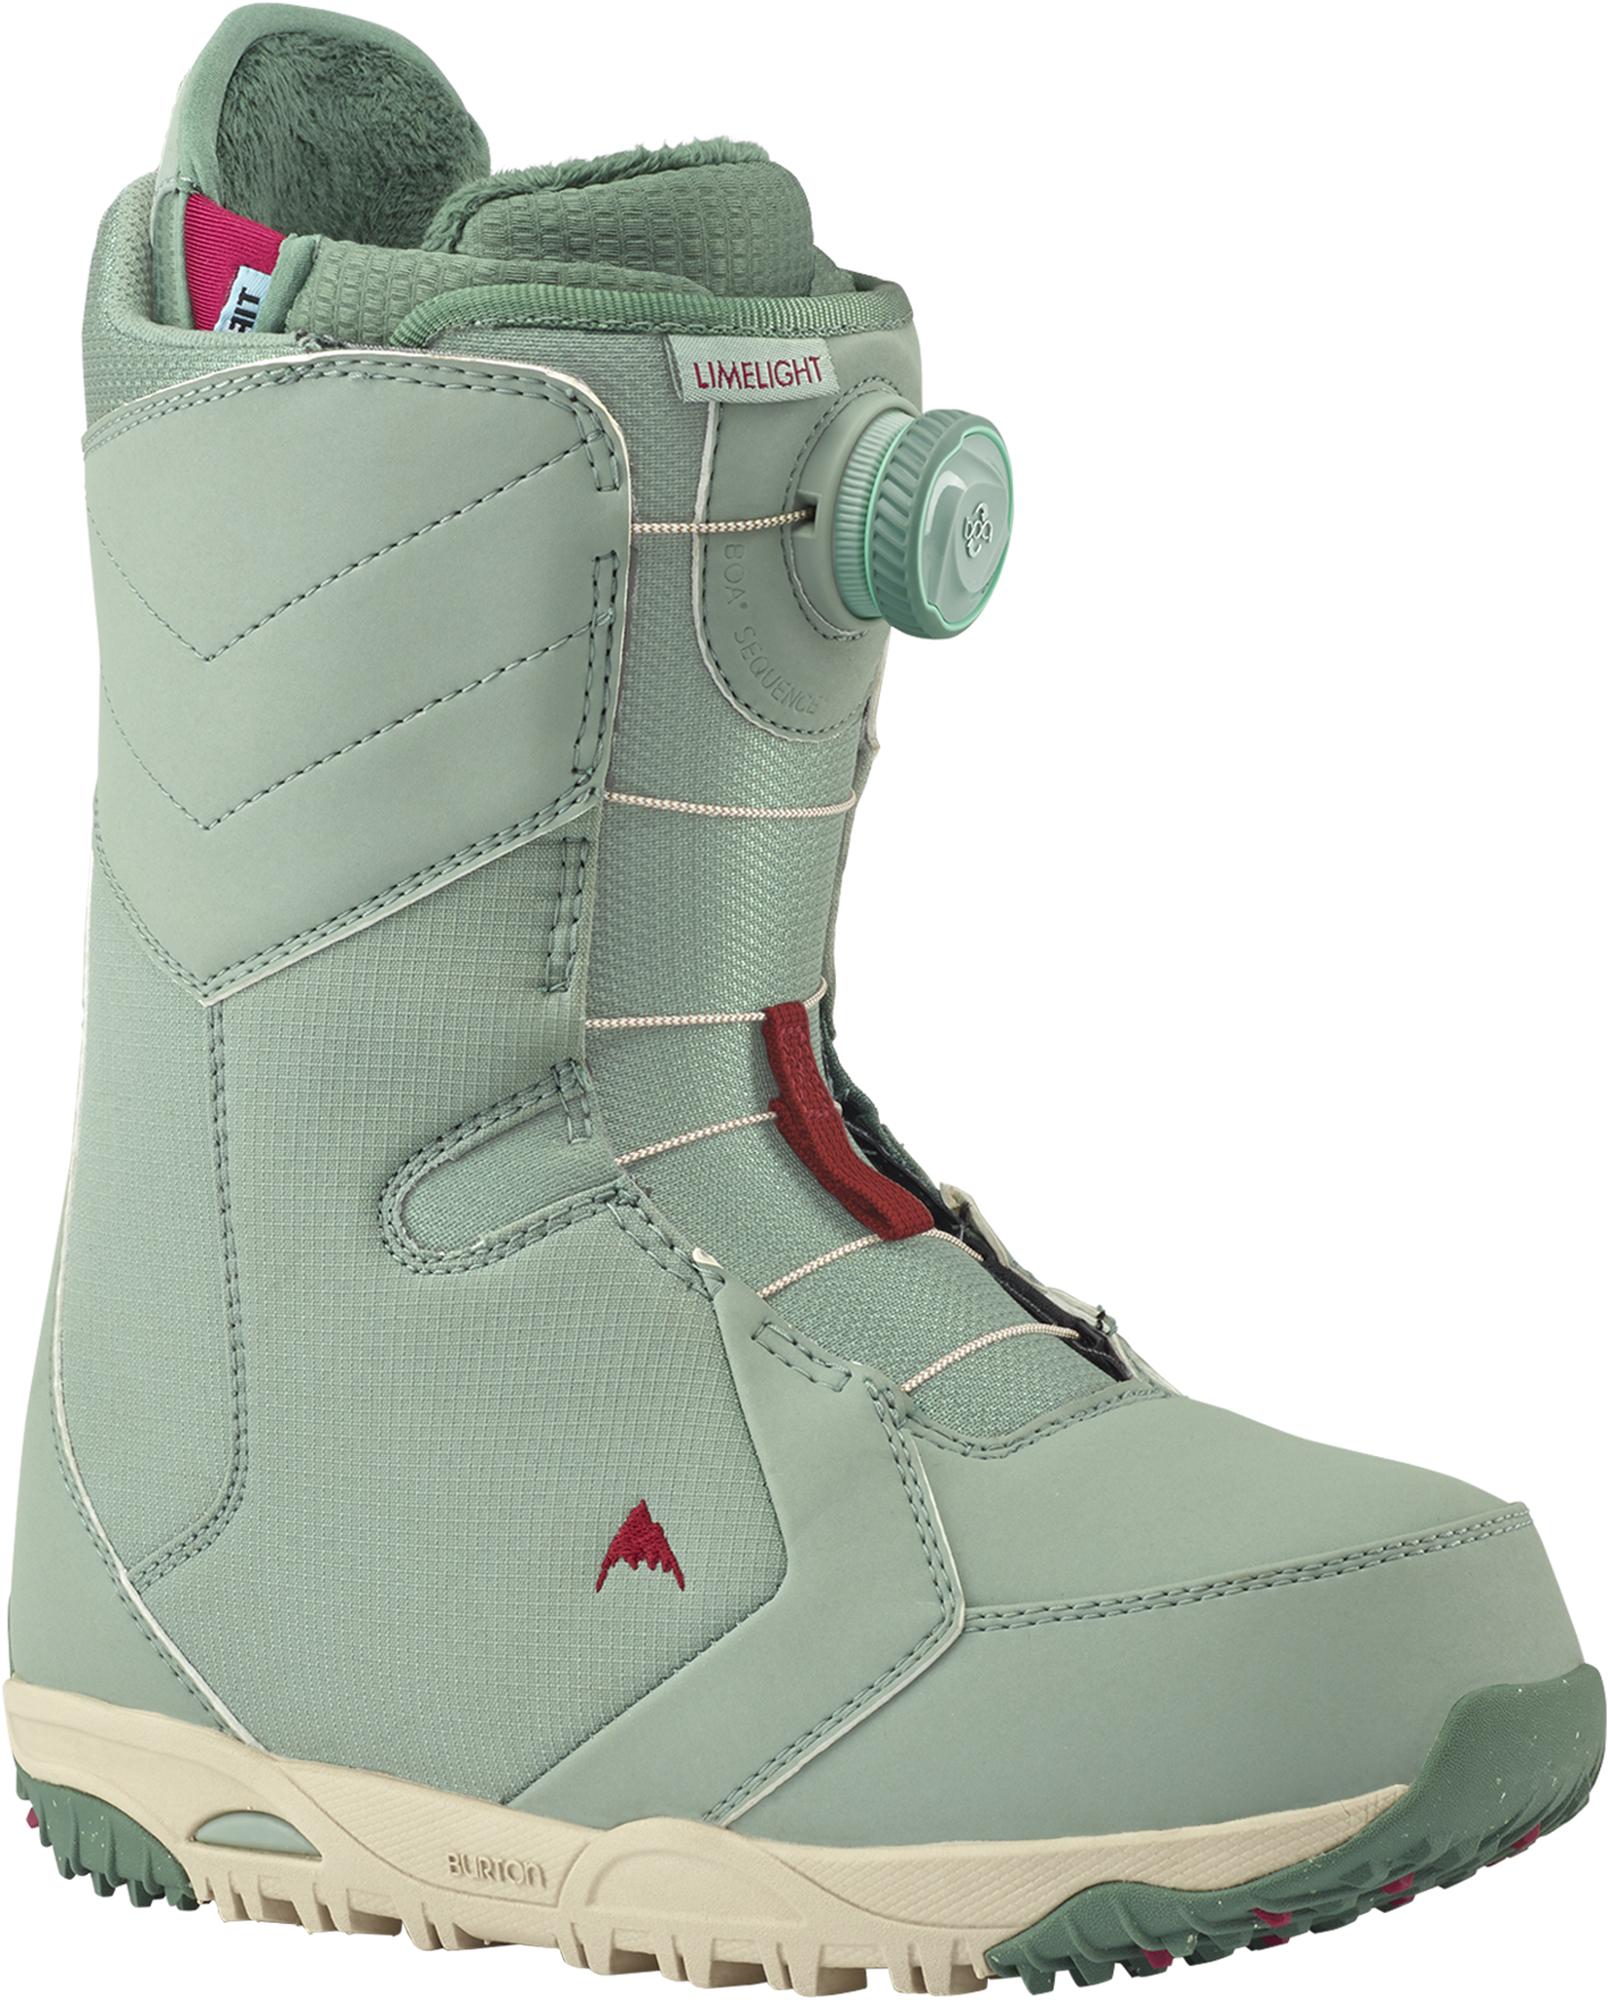 Burton Сноубордические ботинки женские Burton Limelight Boa, размер 38,5 цены онлайн